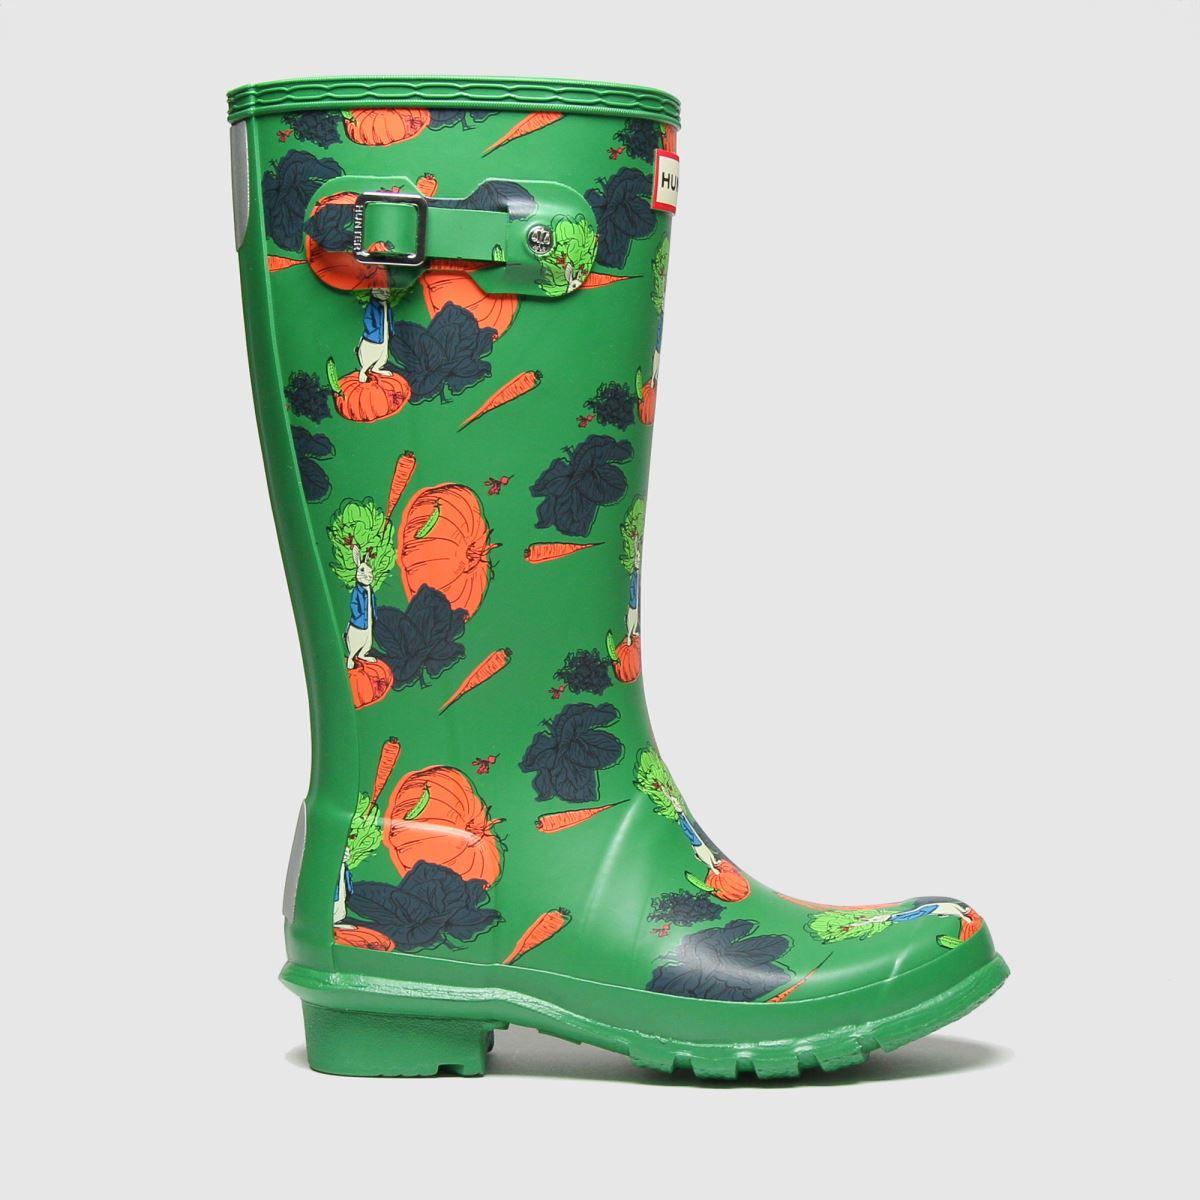 Hunter Green Original Peter Rabbit Boots Youth